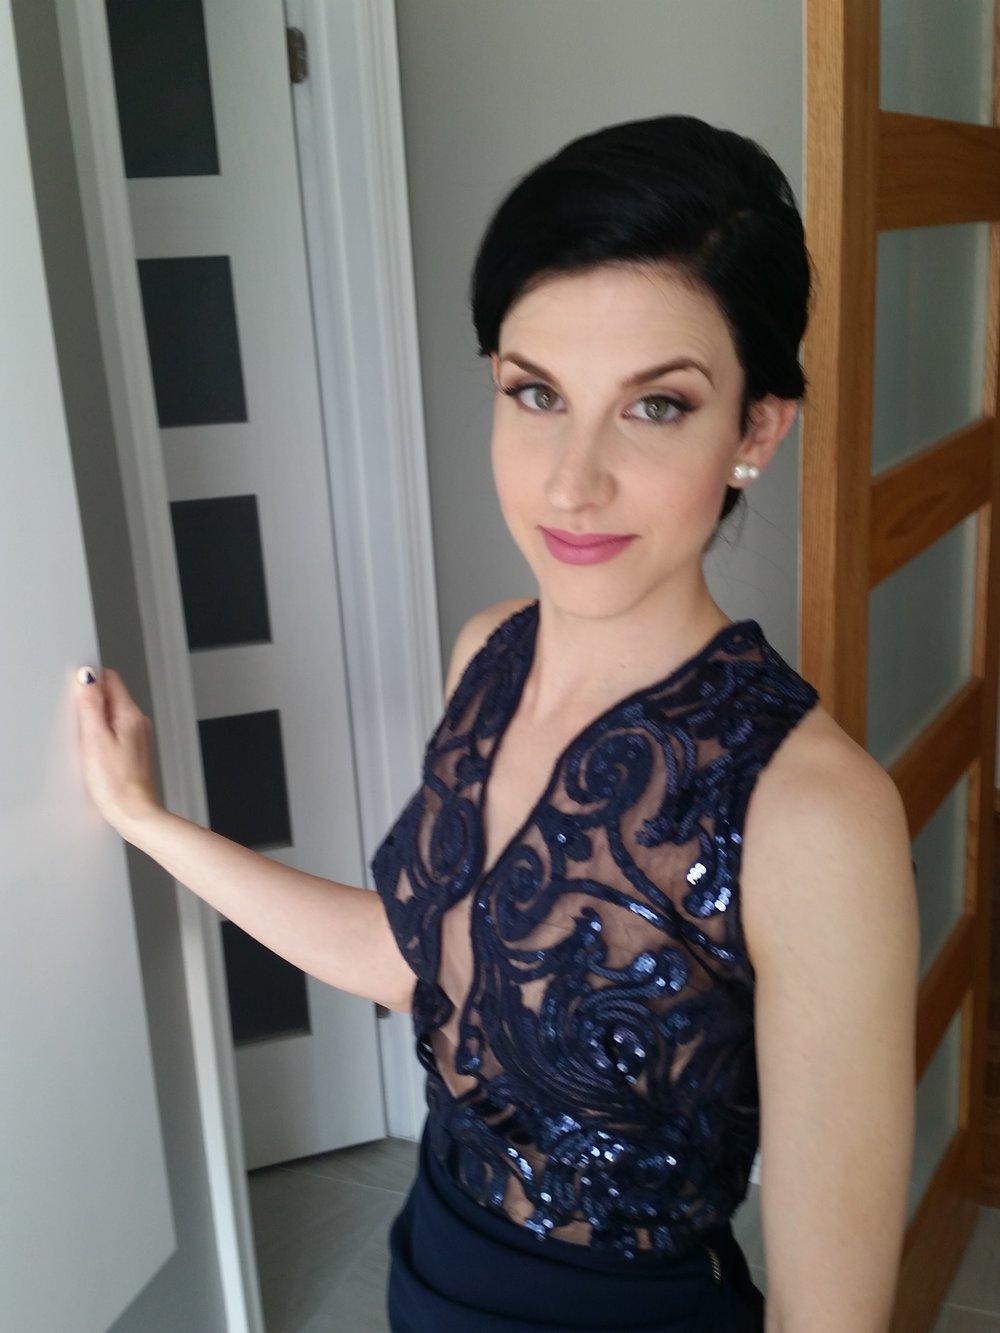 makeup_nicole_richards_whitby_airbrush.jpg